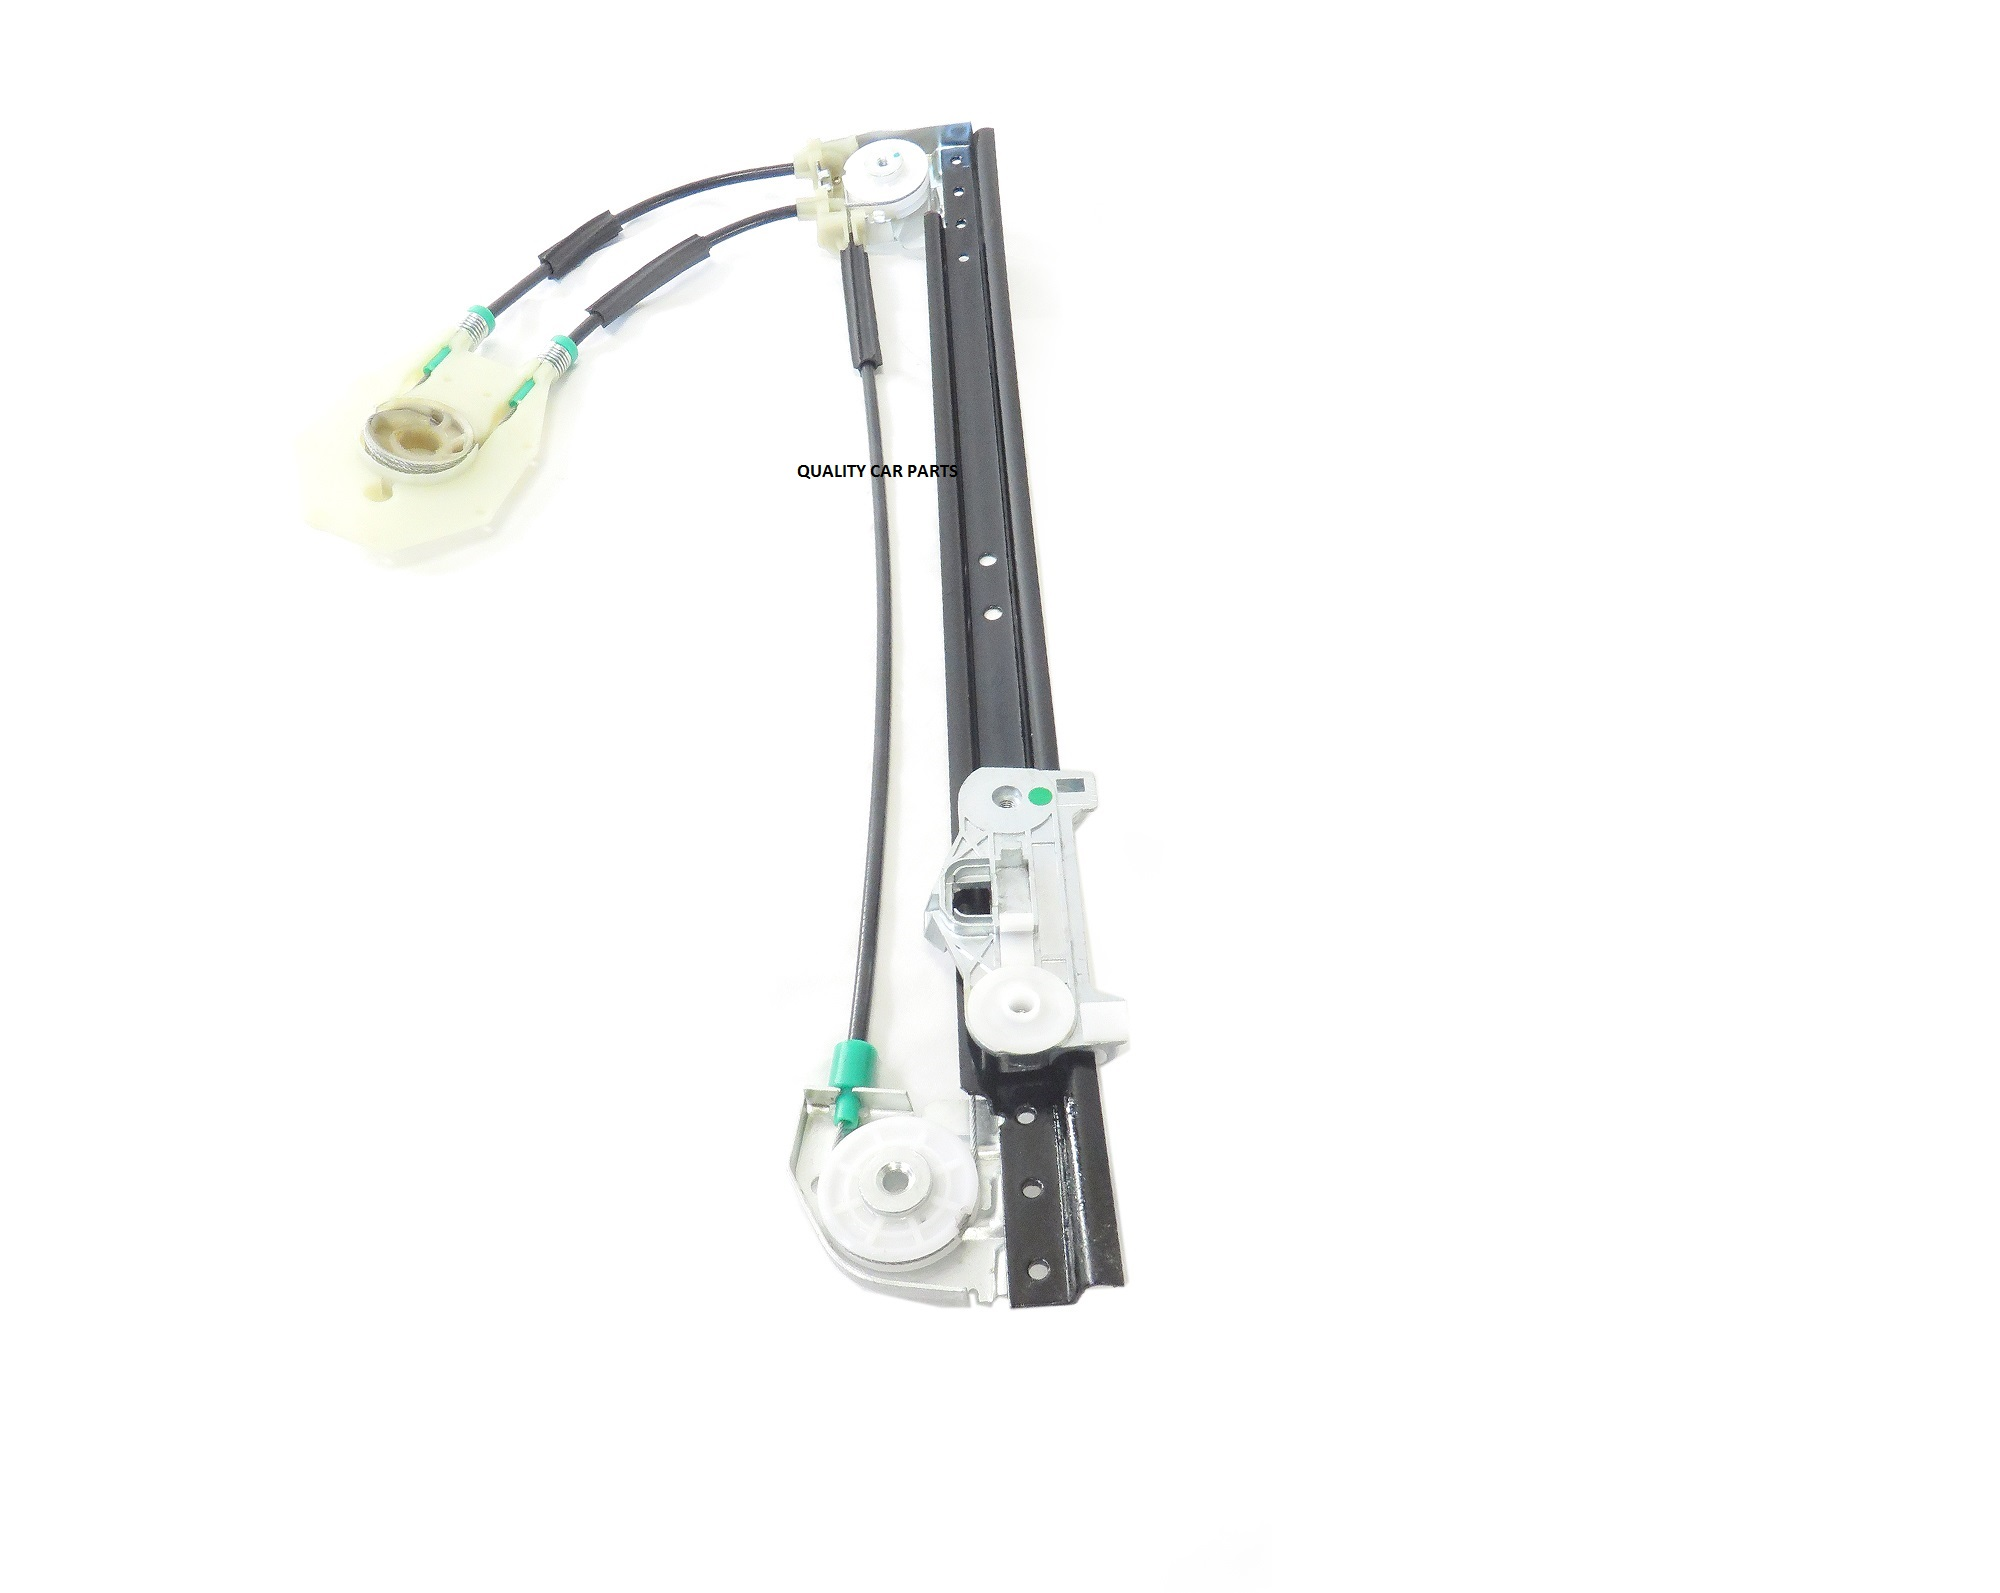 Window Regulator For Bmw E39 5 Series 96 99 Rear Left 520i